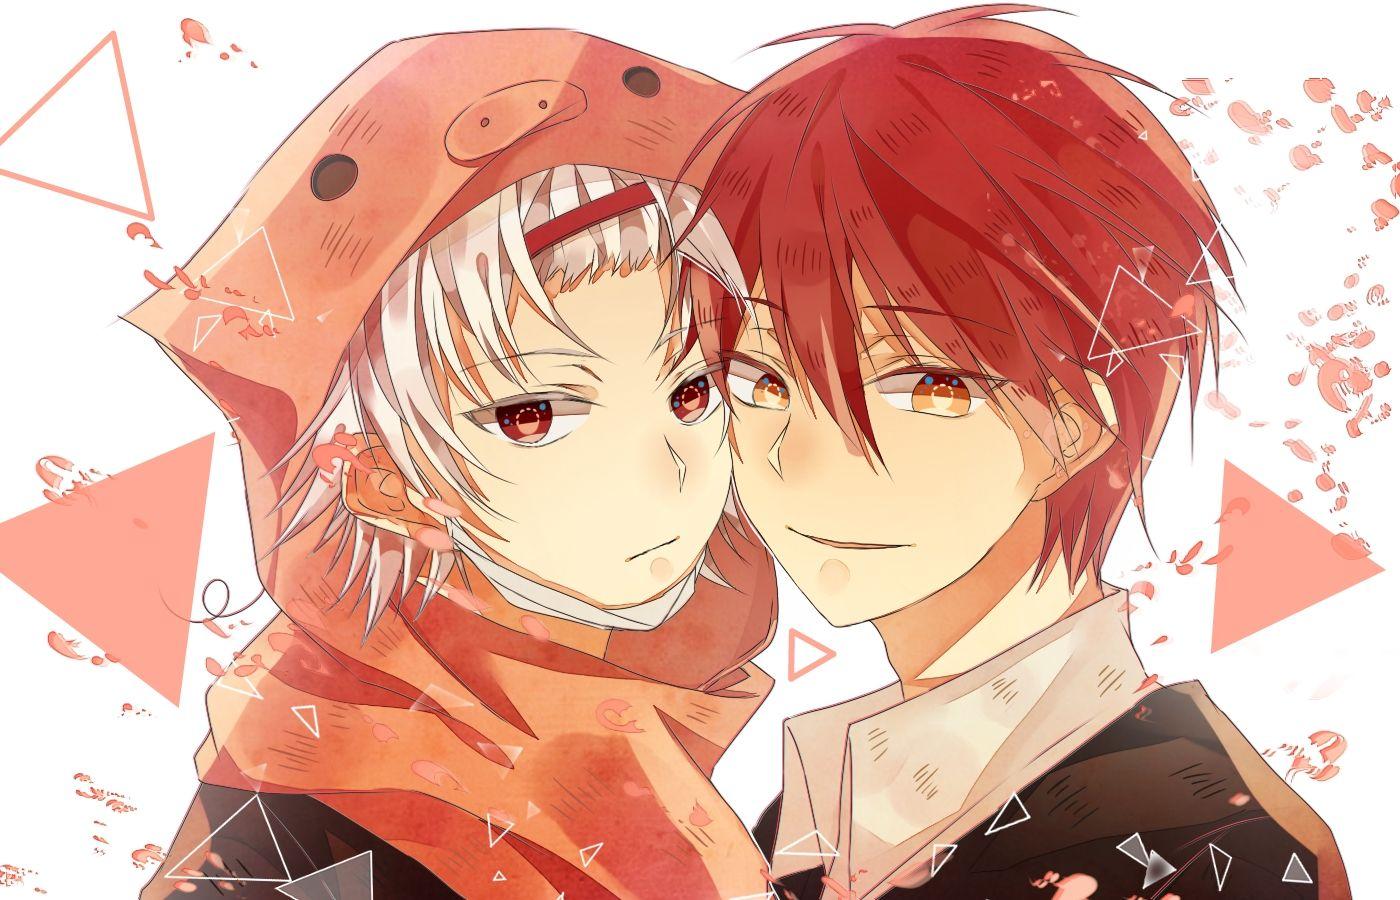 Pin by Nashi on Anime exists Anime, Karma akabane, Anime